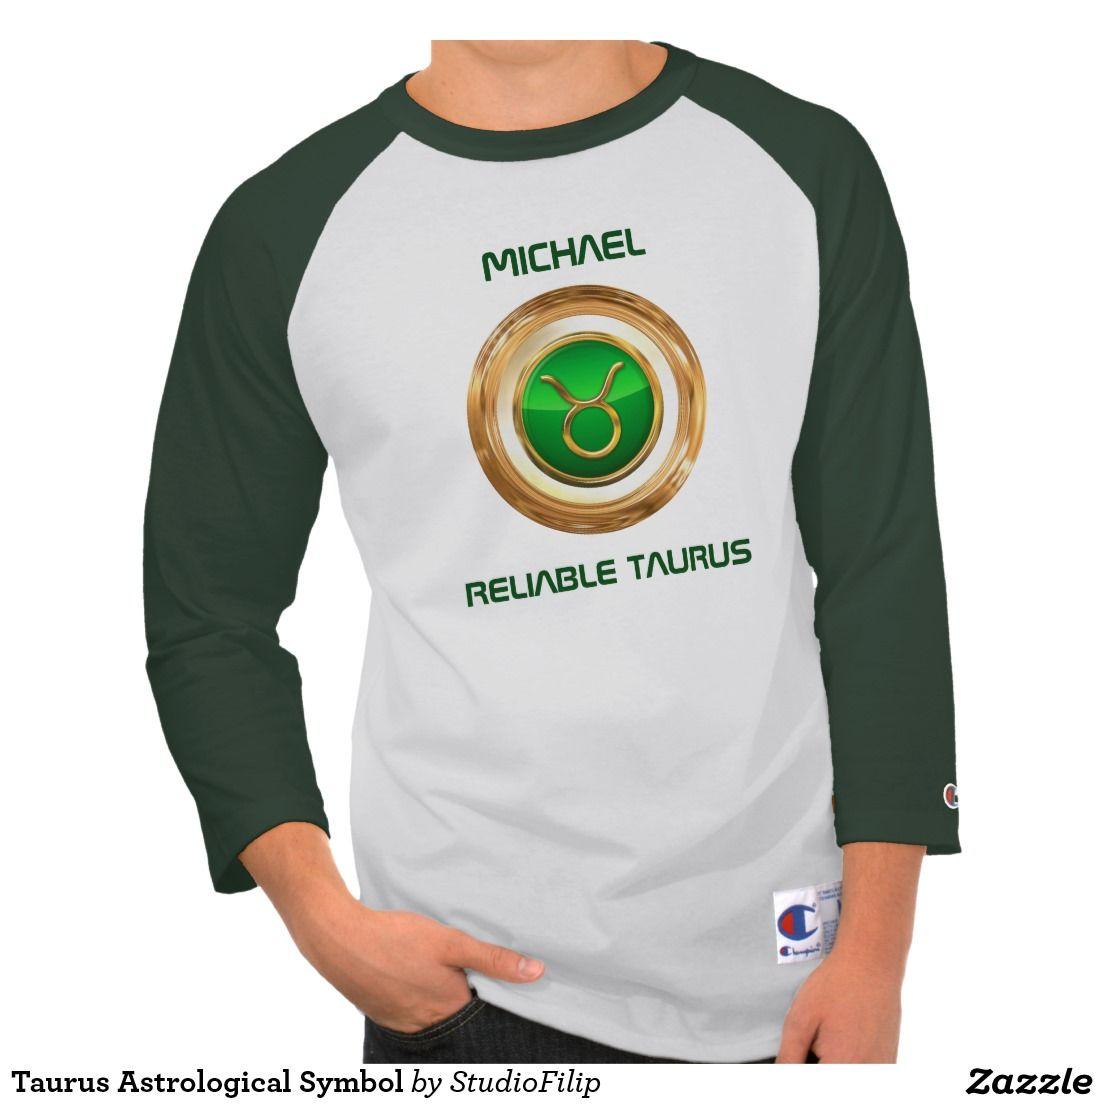 Taurus Astrological Symbol T Shirt Astrological Symbols Taurus